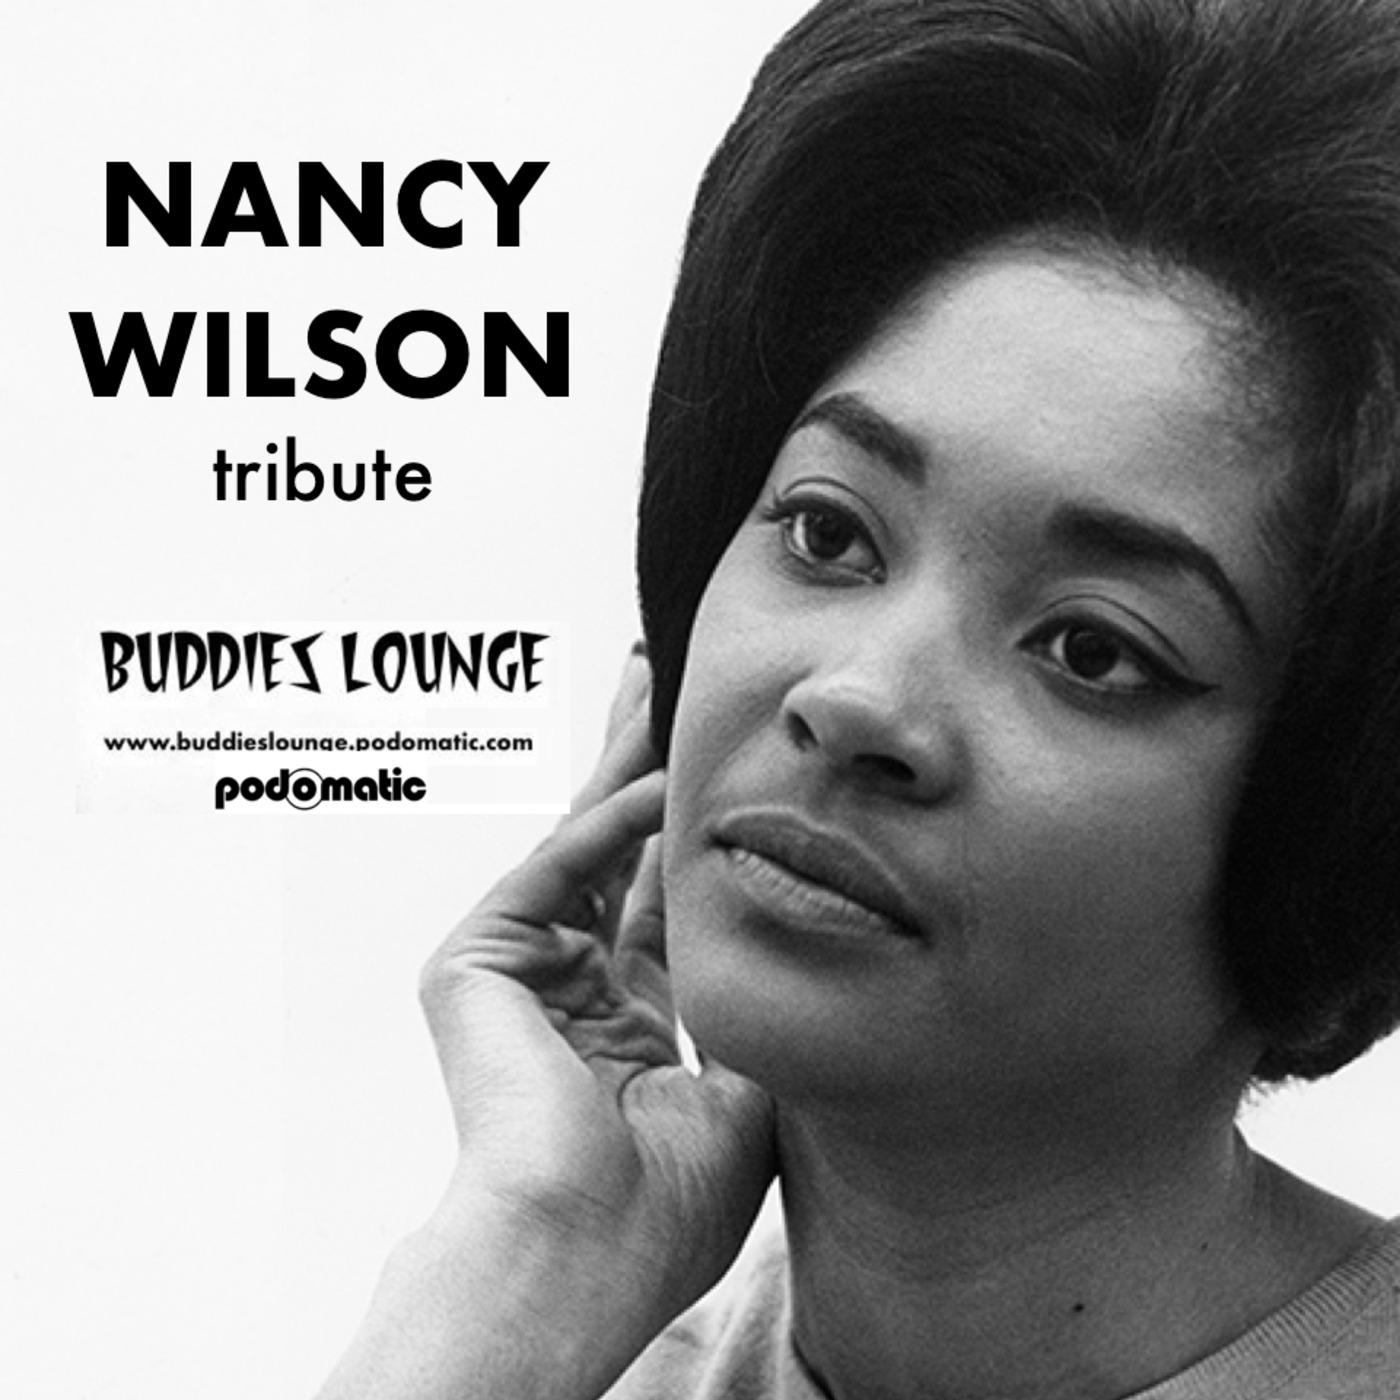 Buddies Lounge - Show 360 (Nancy Wilson Tribute) - Buddies